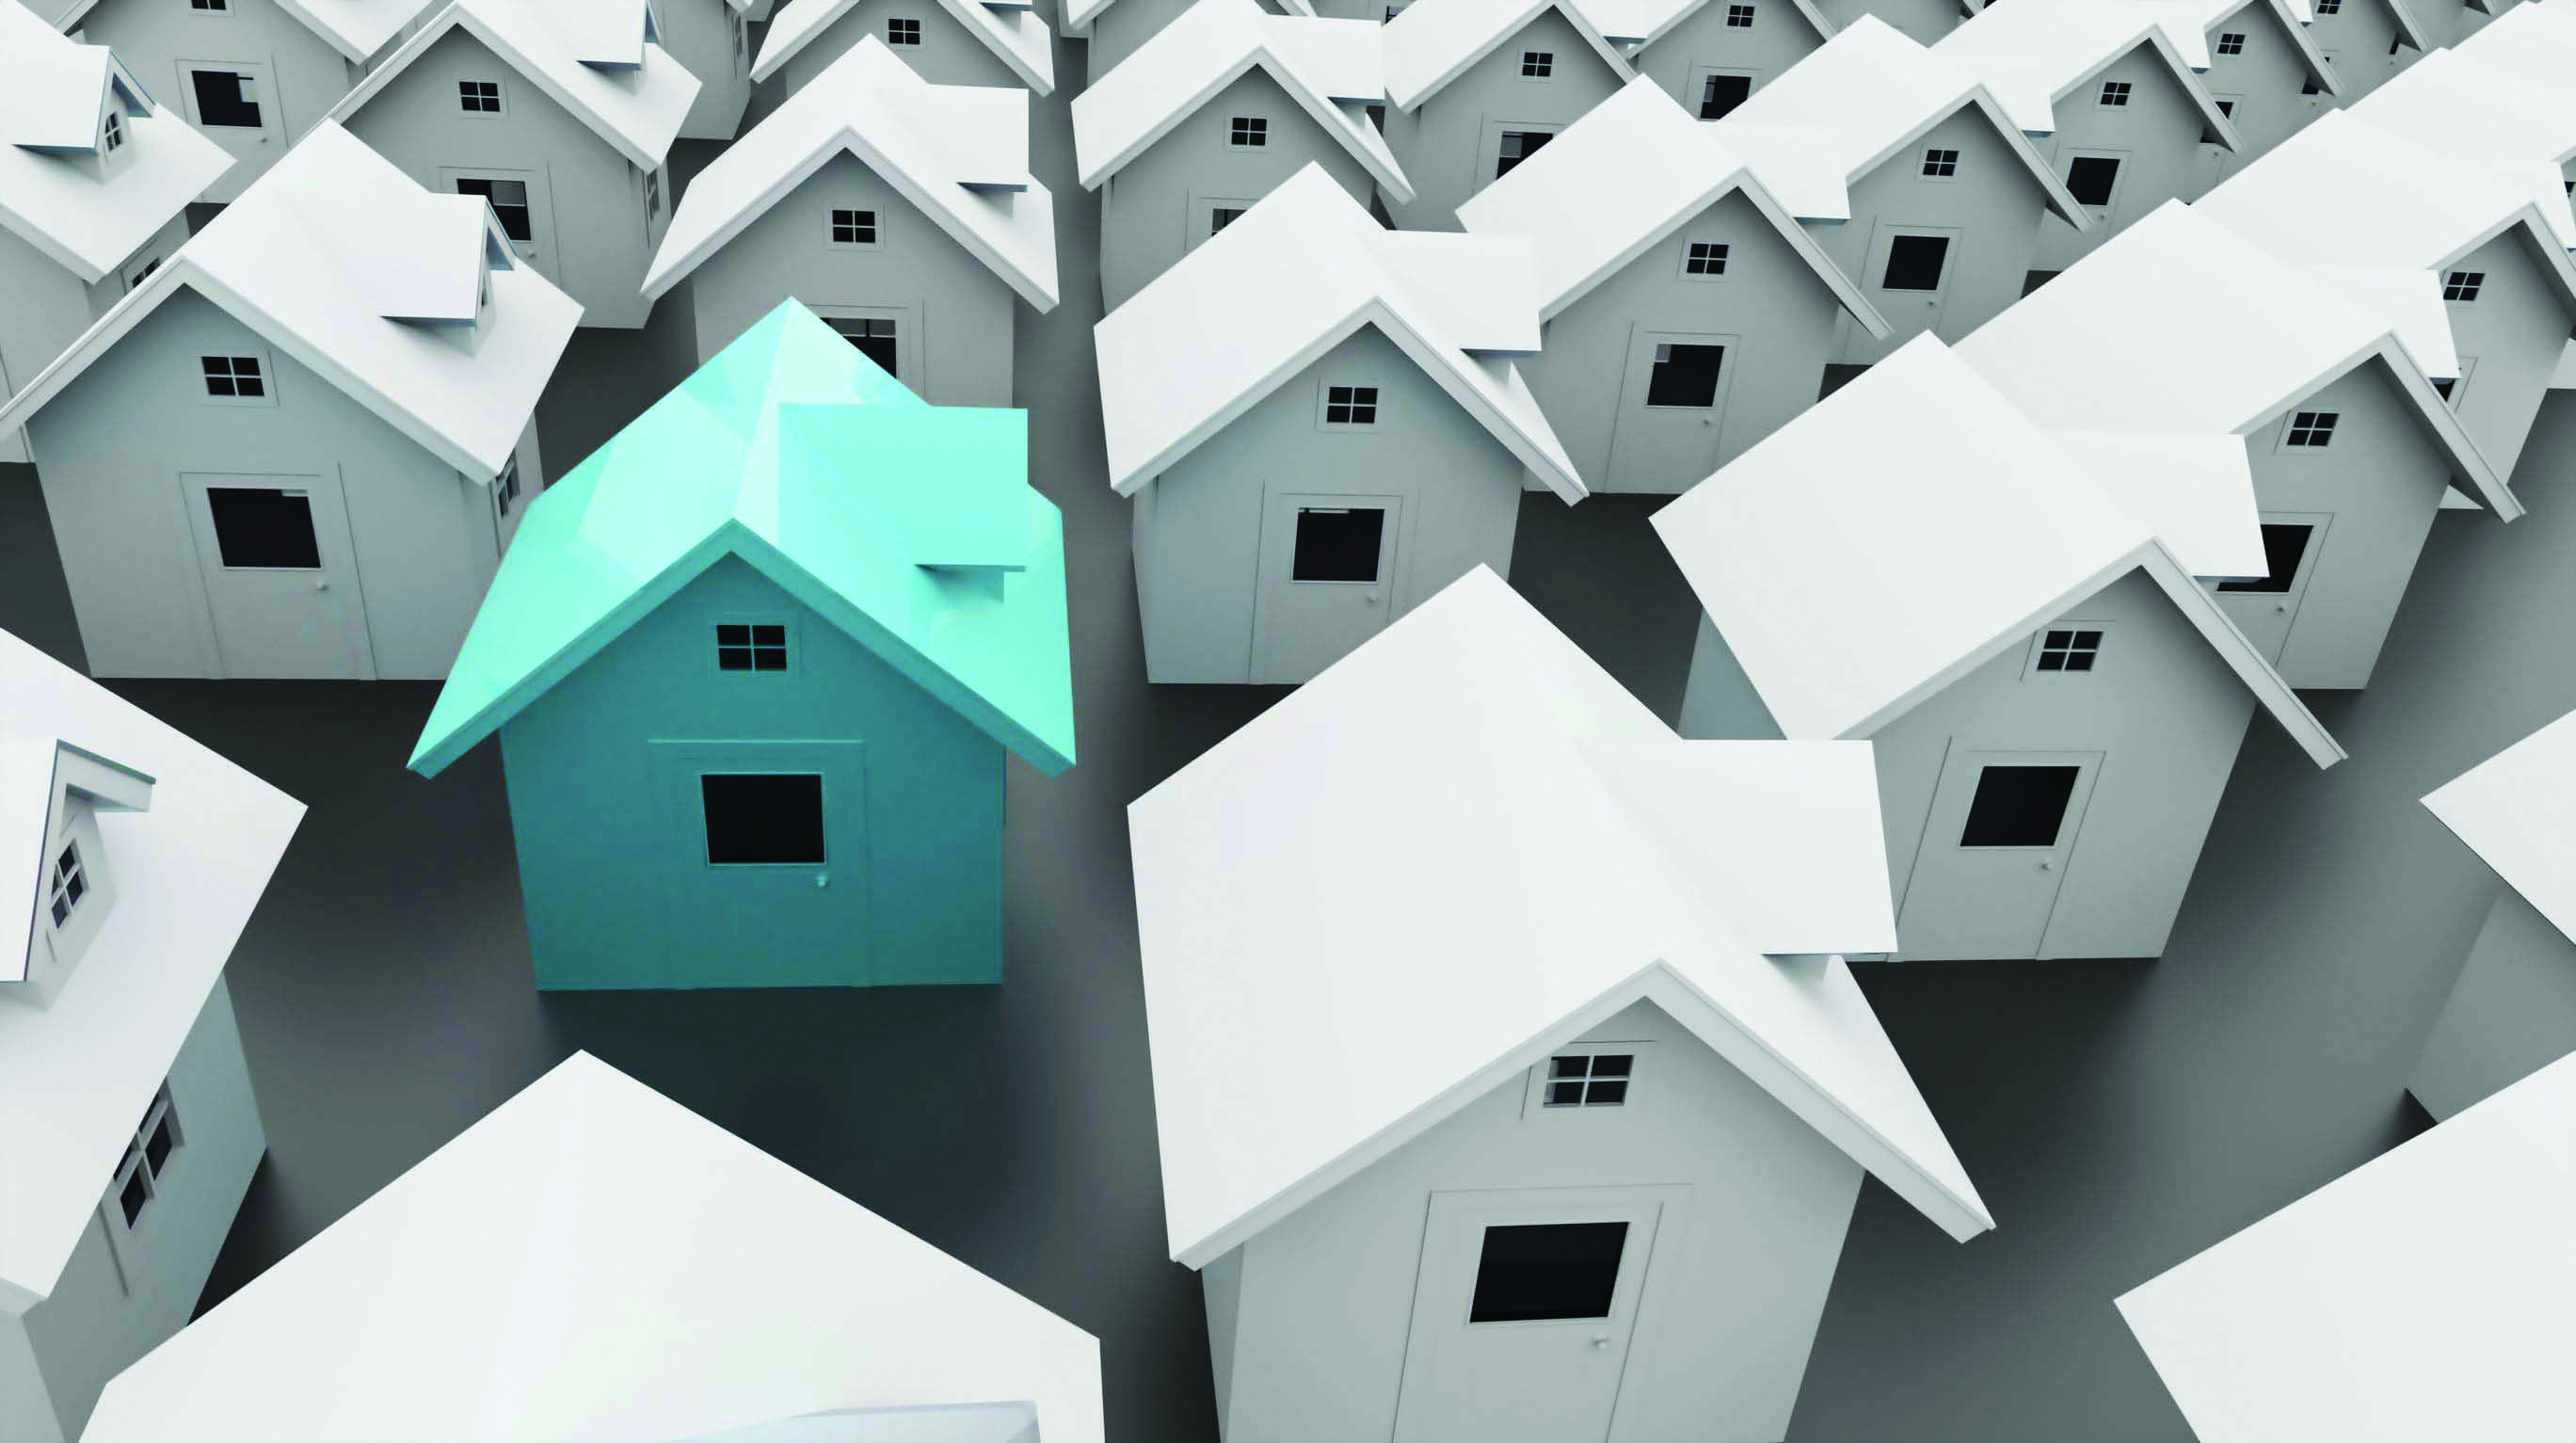 21824804 - house one blue